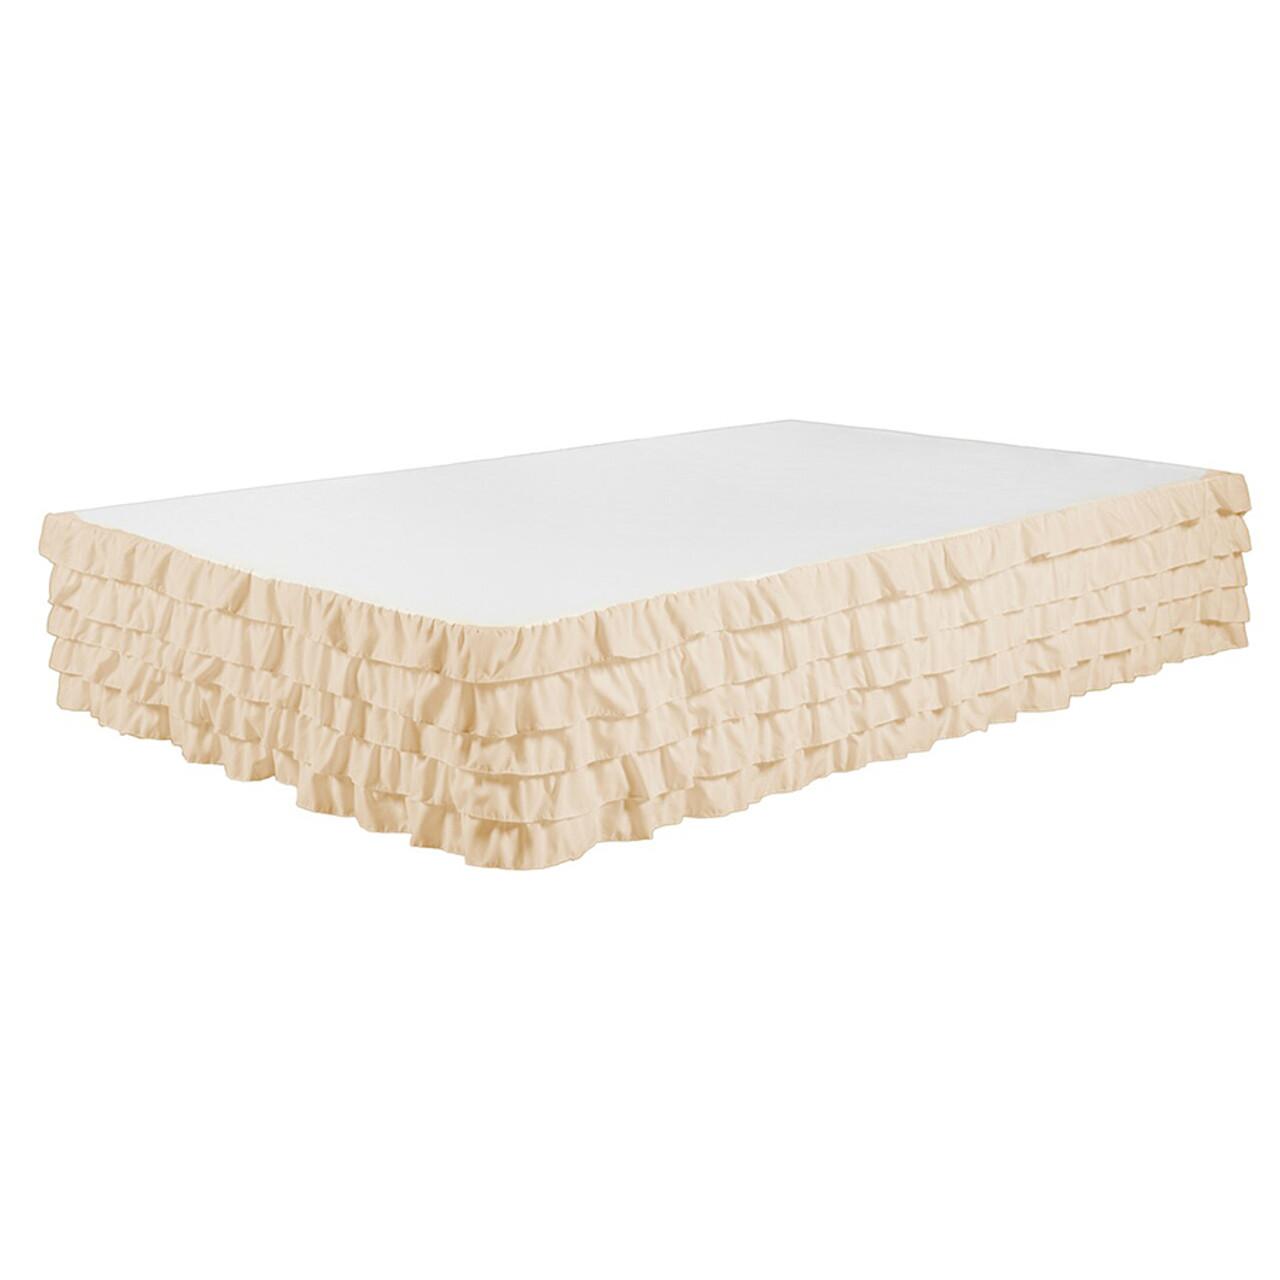 "Beige Bed Skirt Tiered Dust Ruffle 100% Brushed Microfiber with 14"" Drop in USA, California, New York, New York City, Los Angeles, San Francisco, Pennsylvania, Washington DC, Virginia, Maryland"